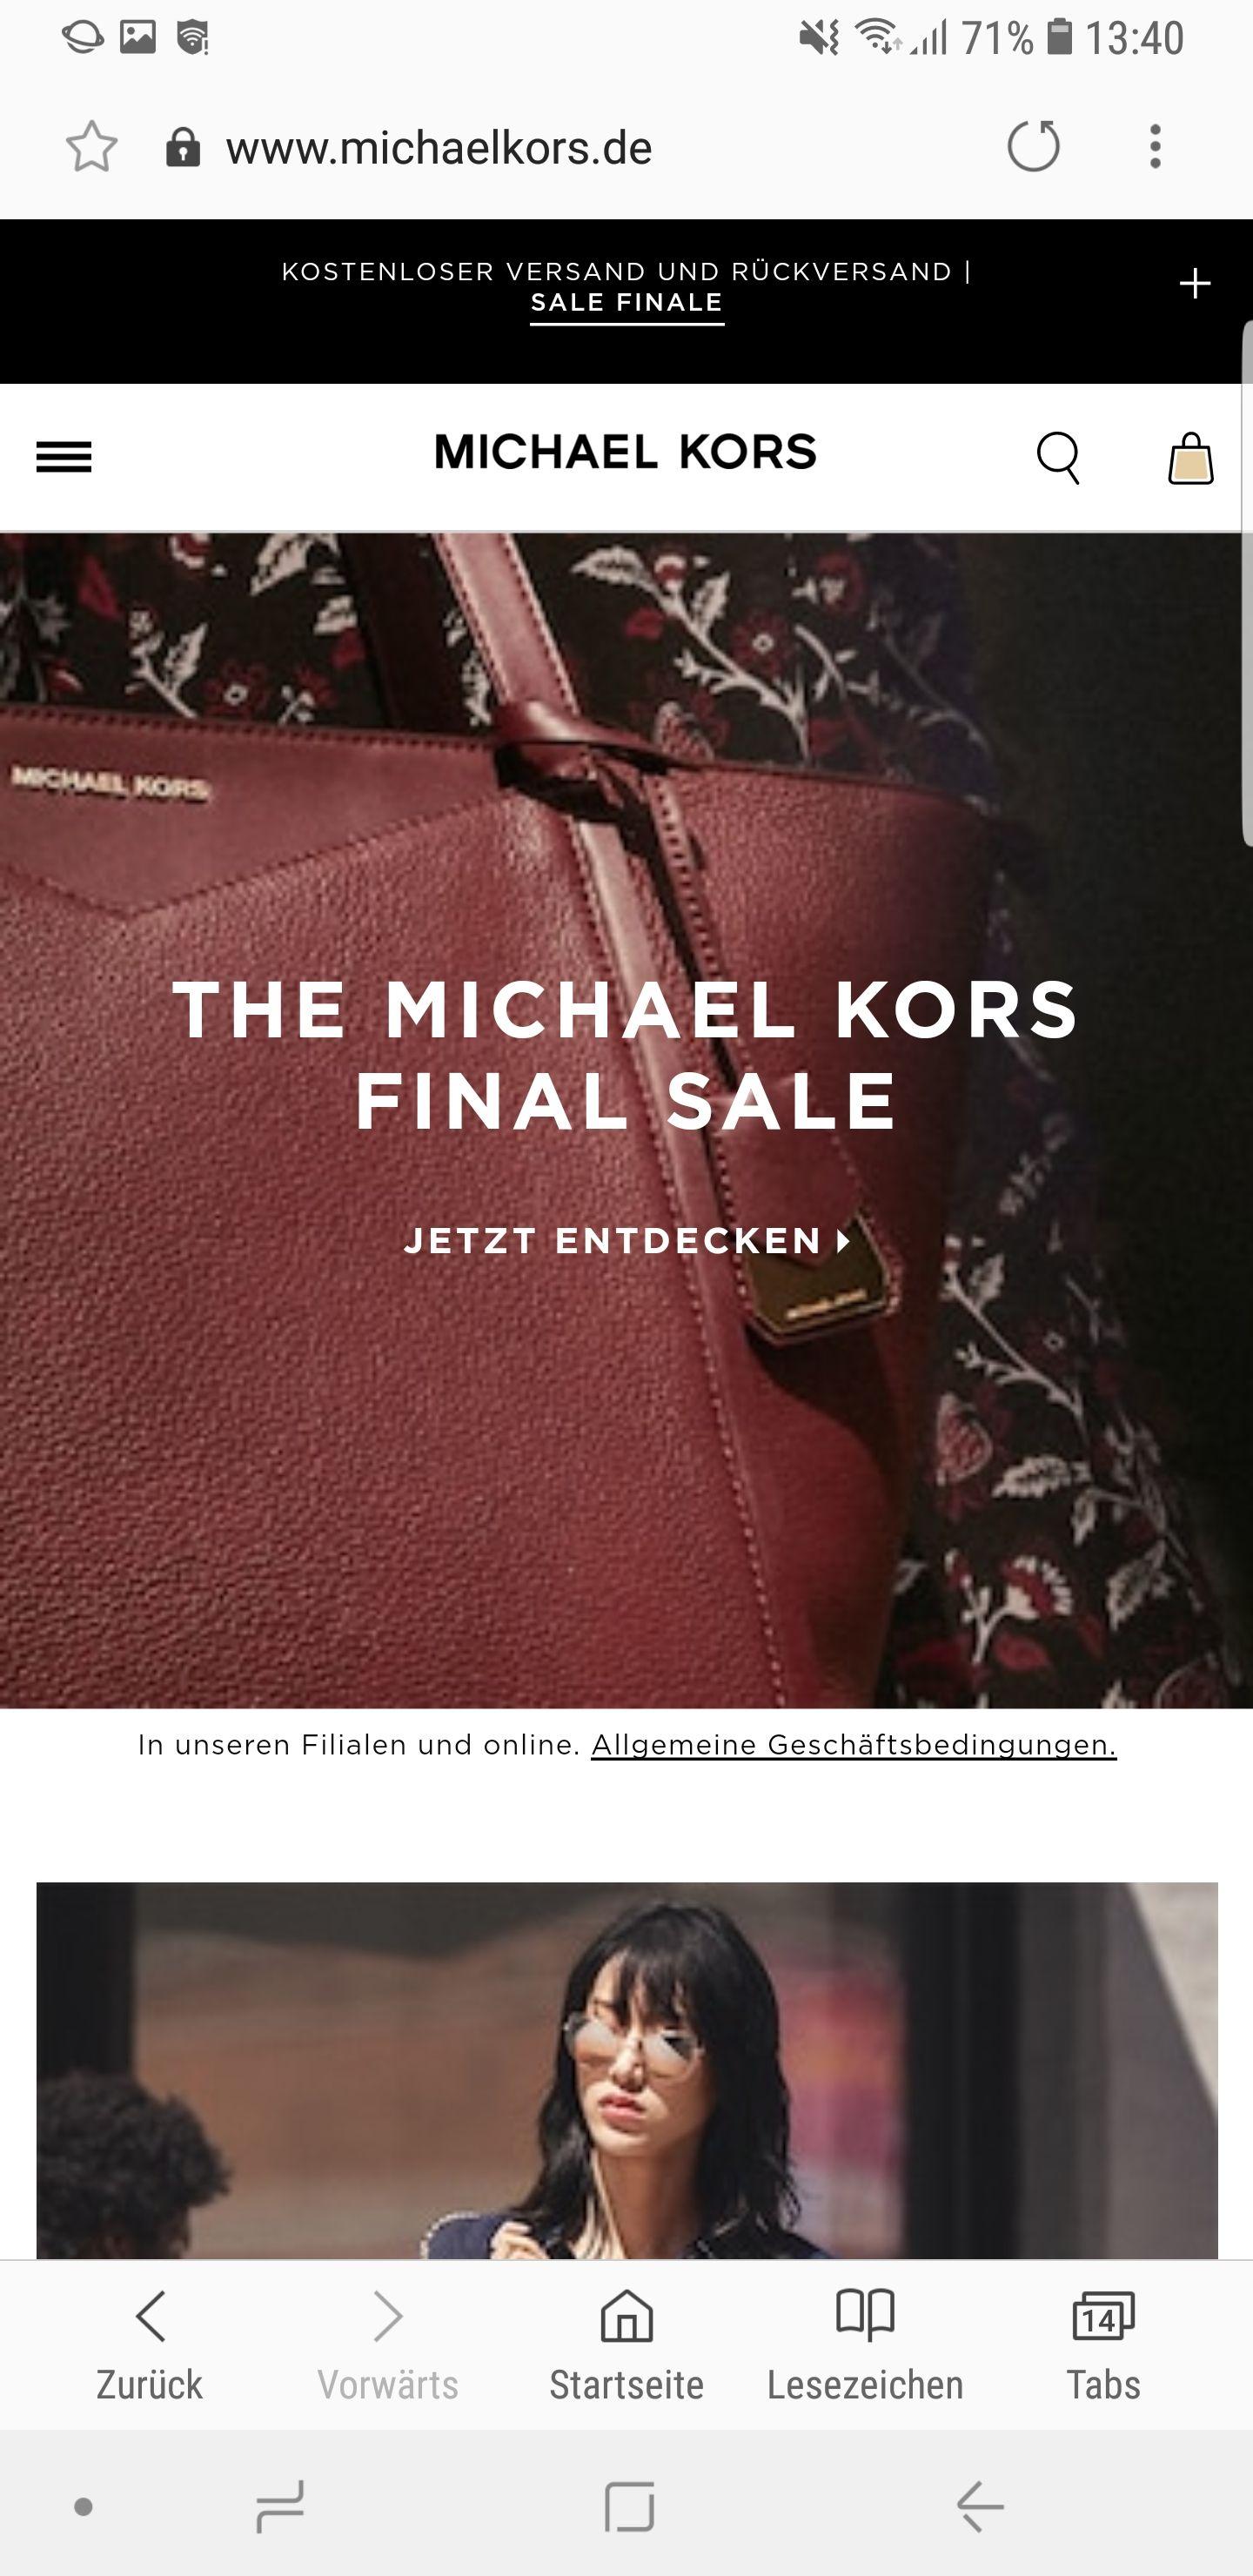 Final Sale Michael Kors Beispiel im Deal